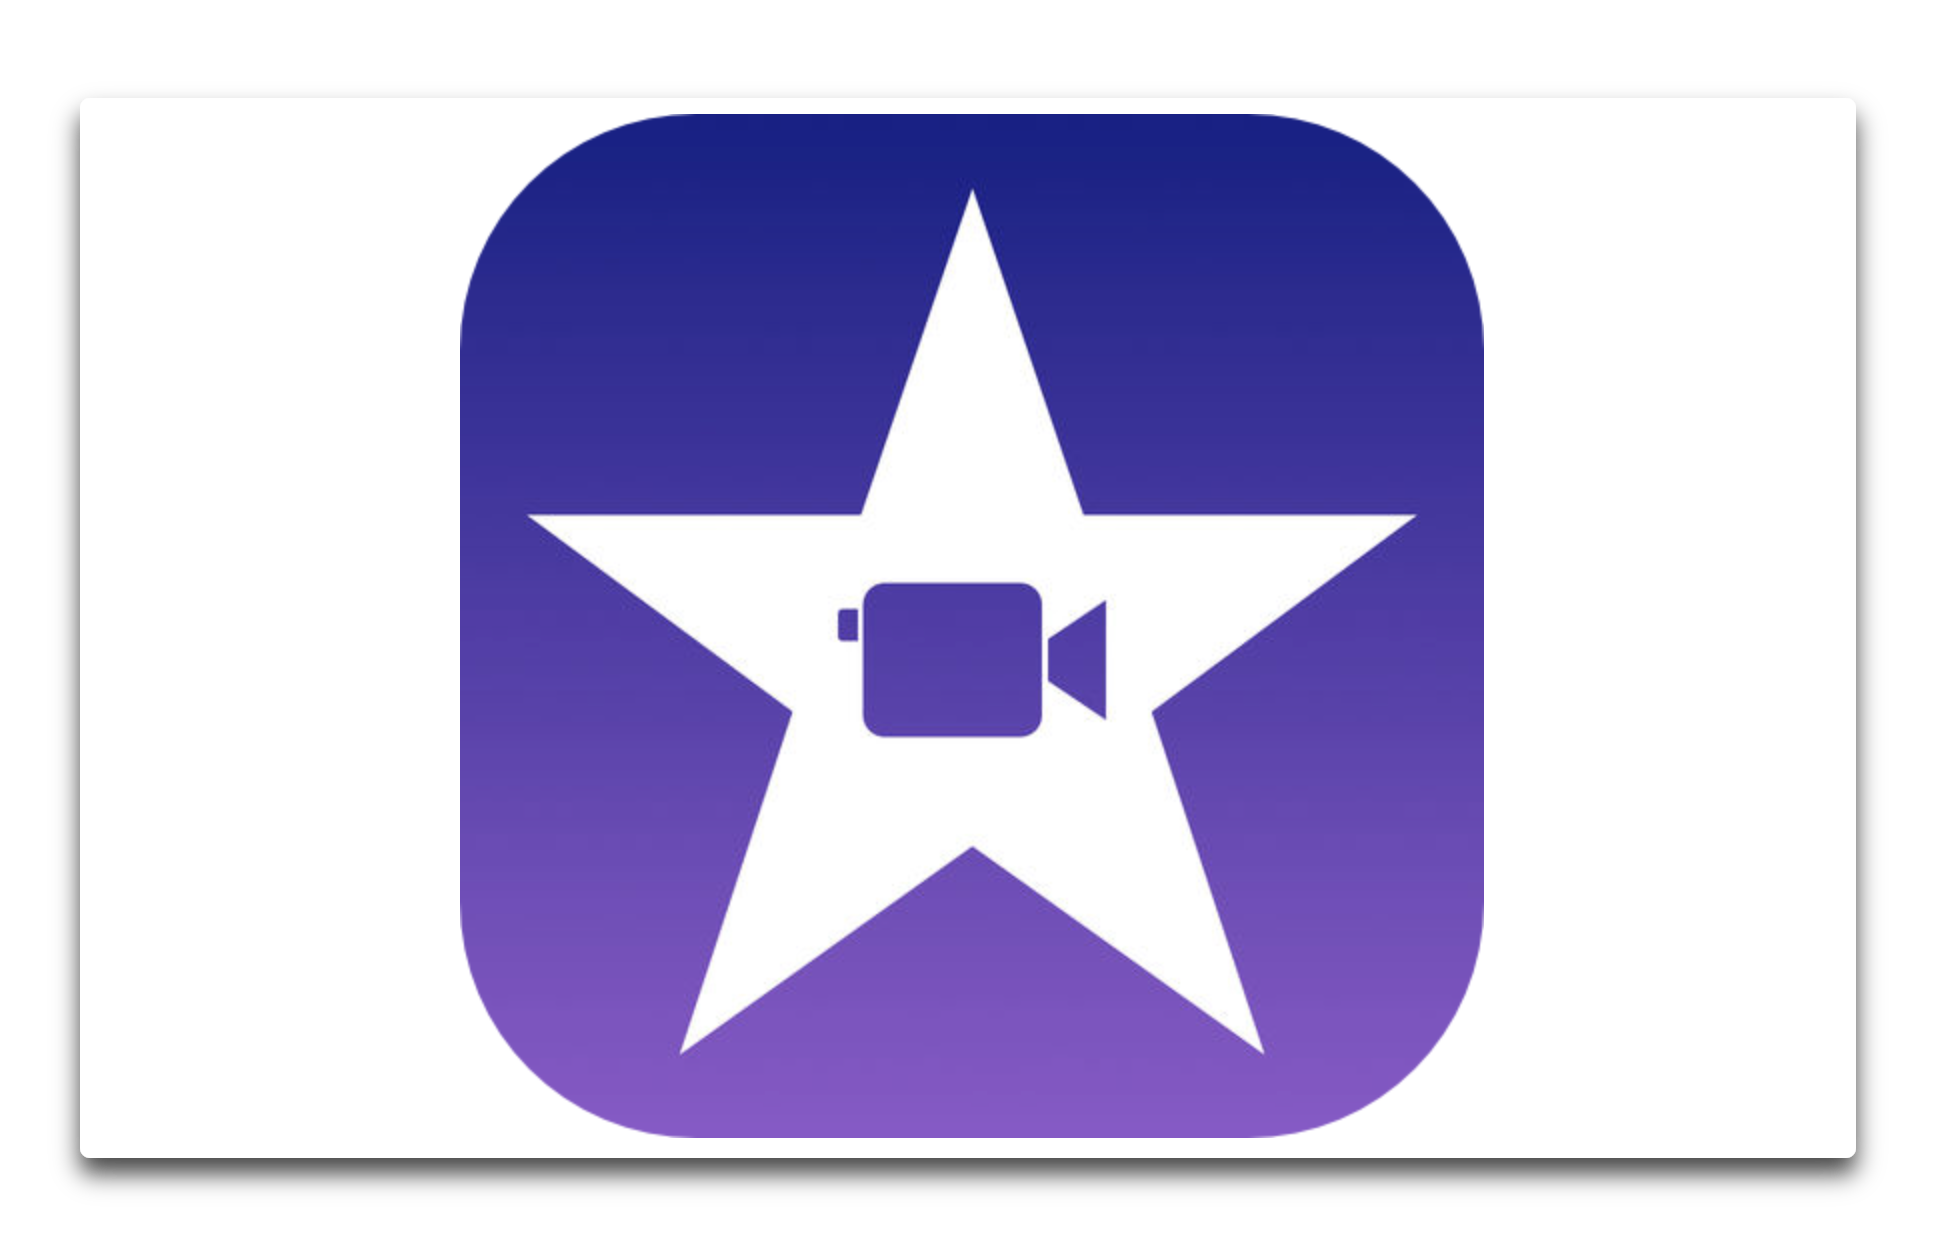 Apple、iPhone XのSuper Retinaディスプレイに合わせた「iMovie 2.2.5」をリリース